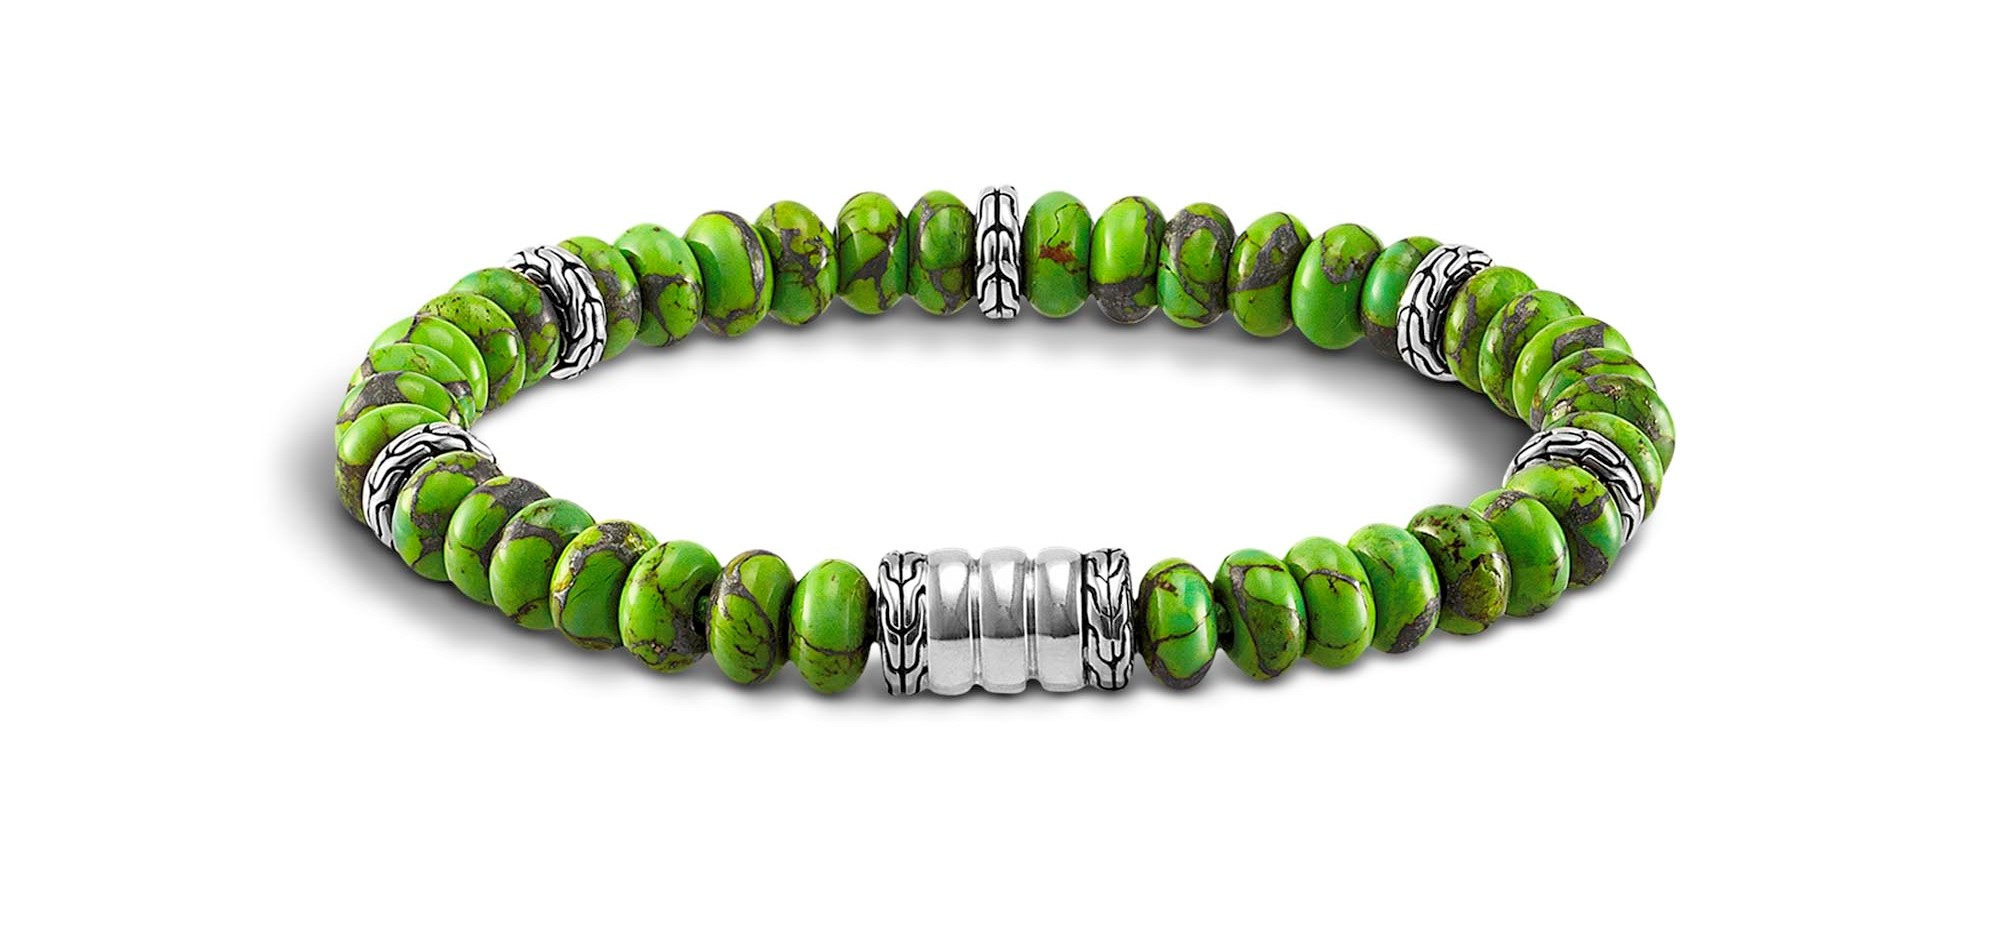 bracelet available from Diamond Diamond design